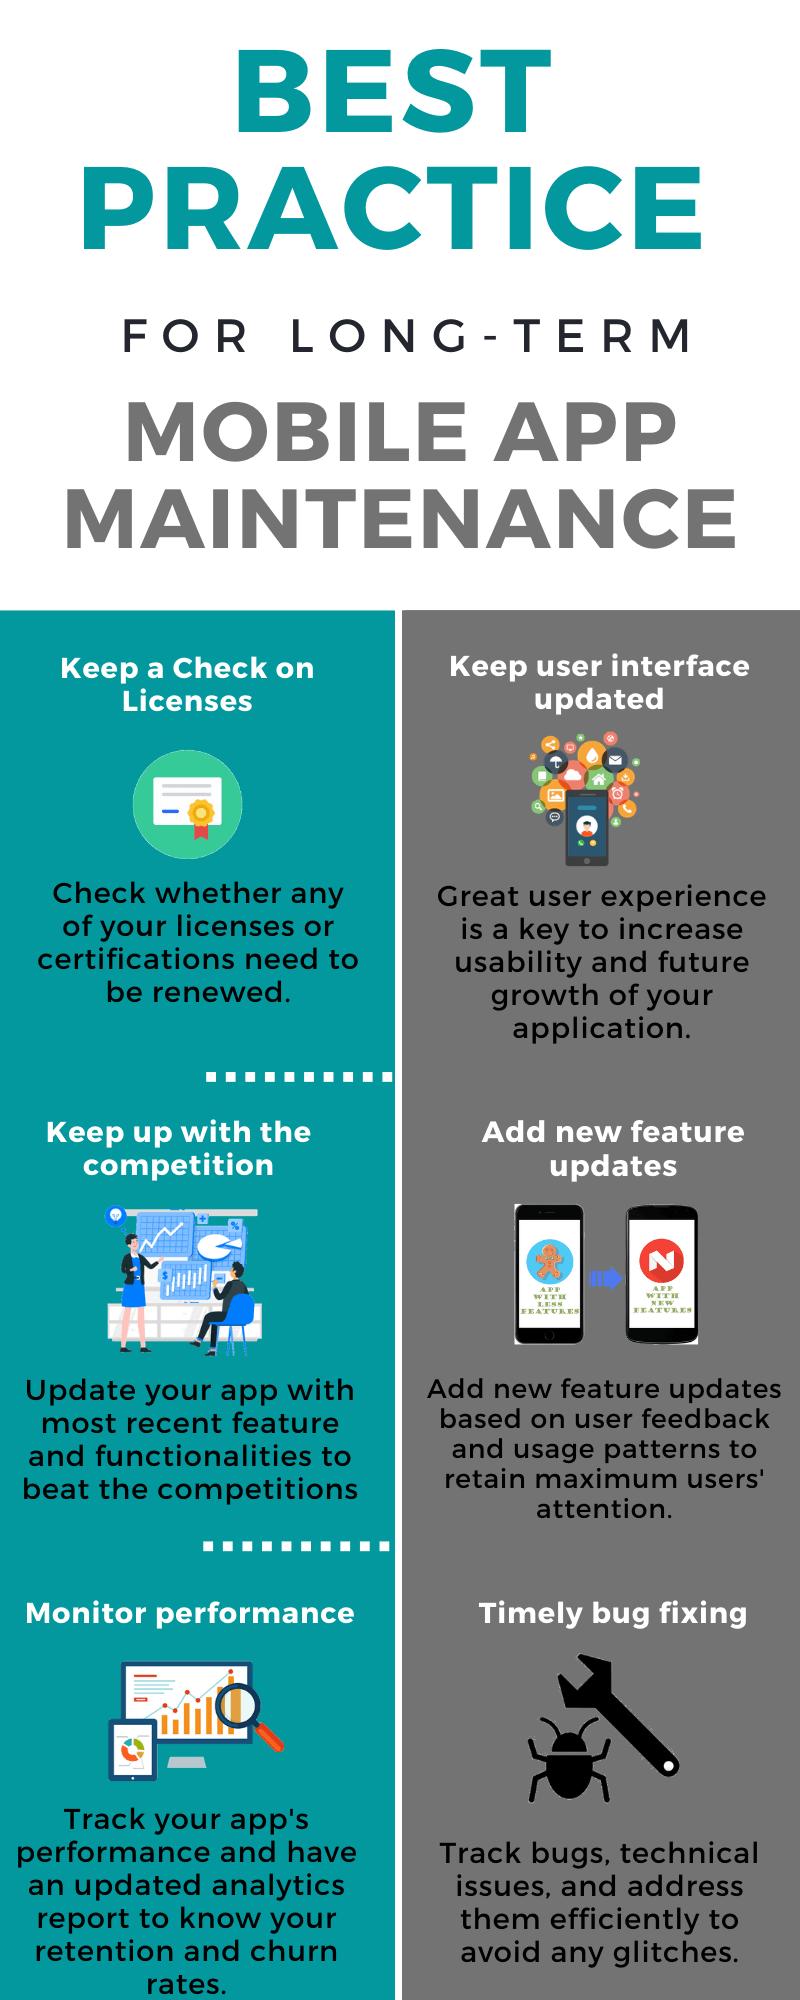 Best Practice For Long-term Mobile App-Maintenance